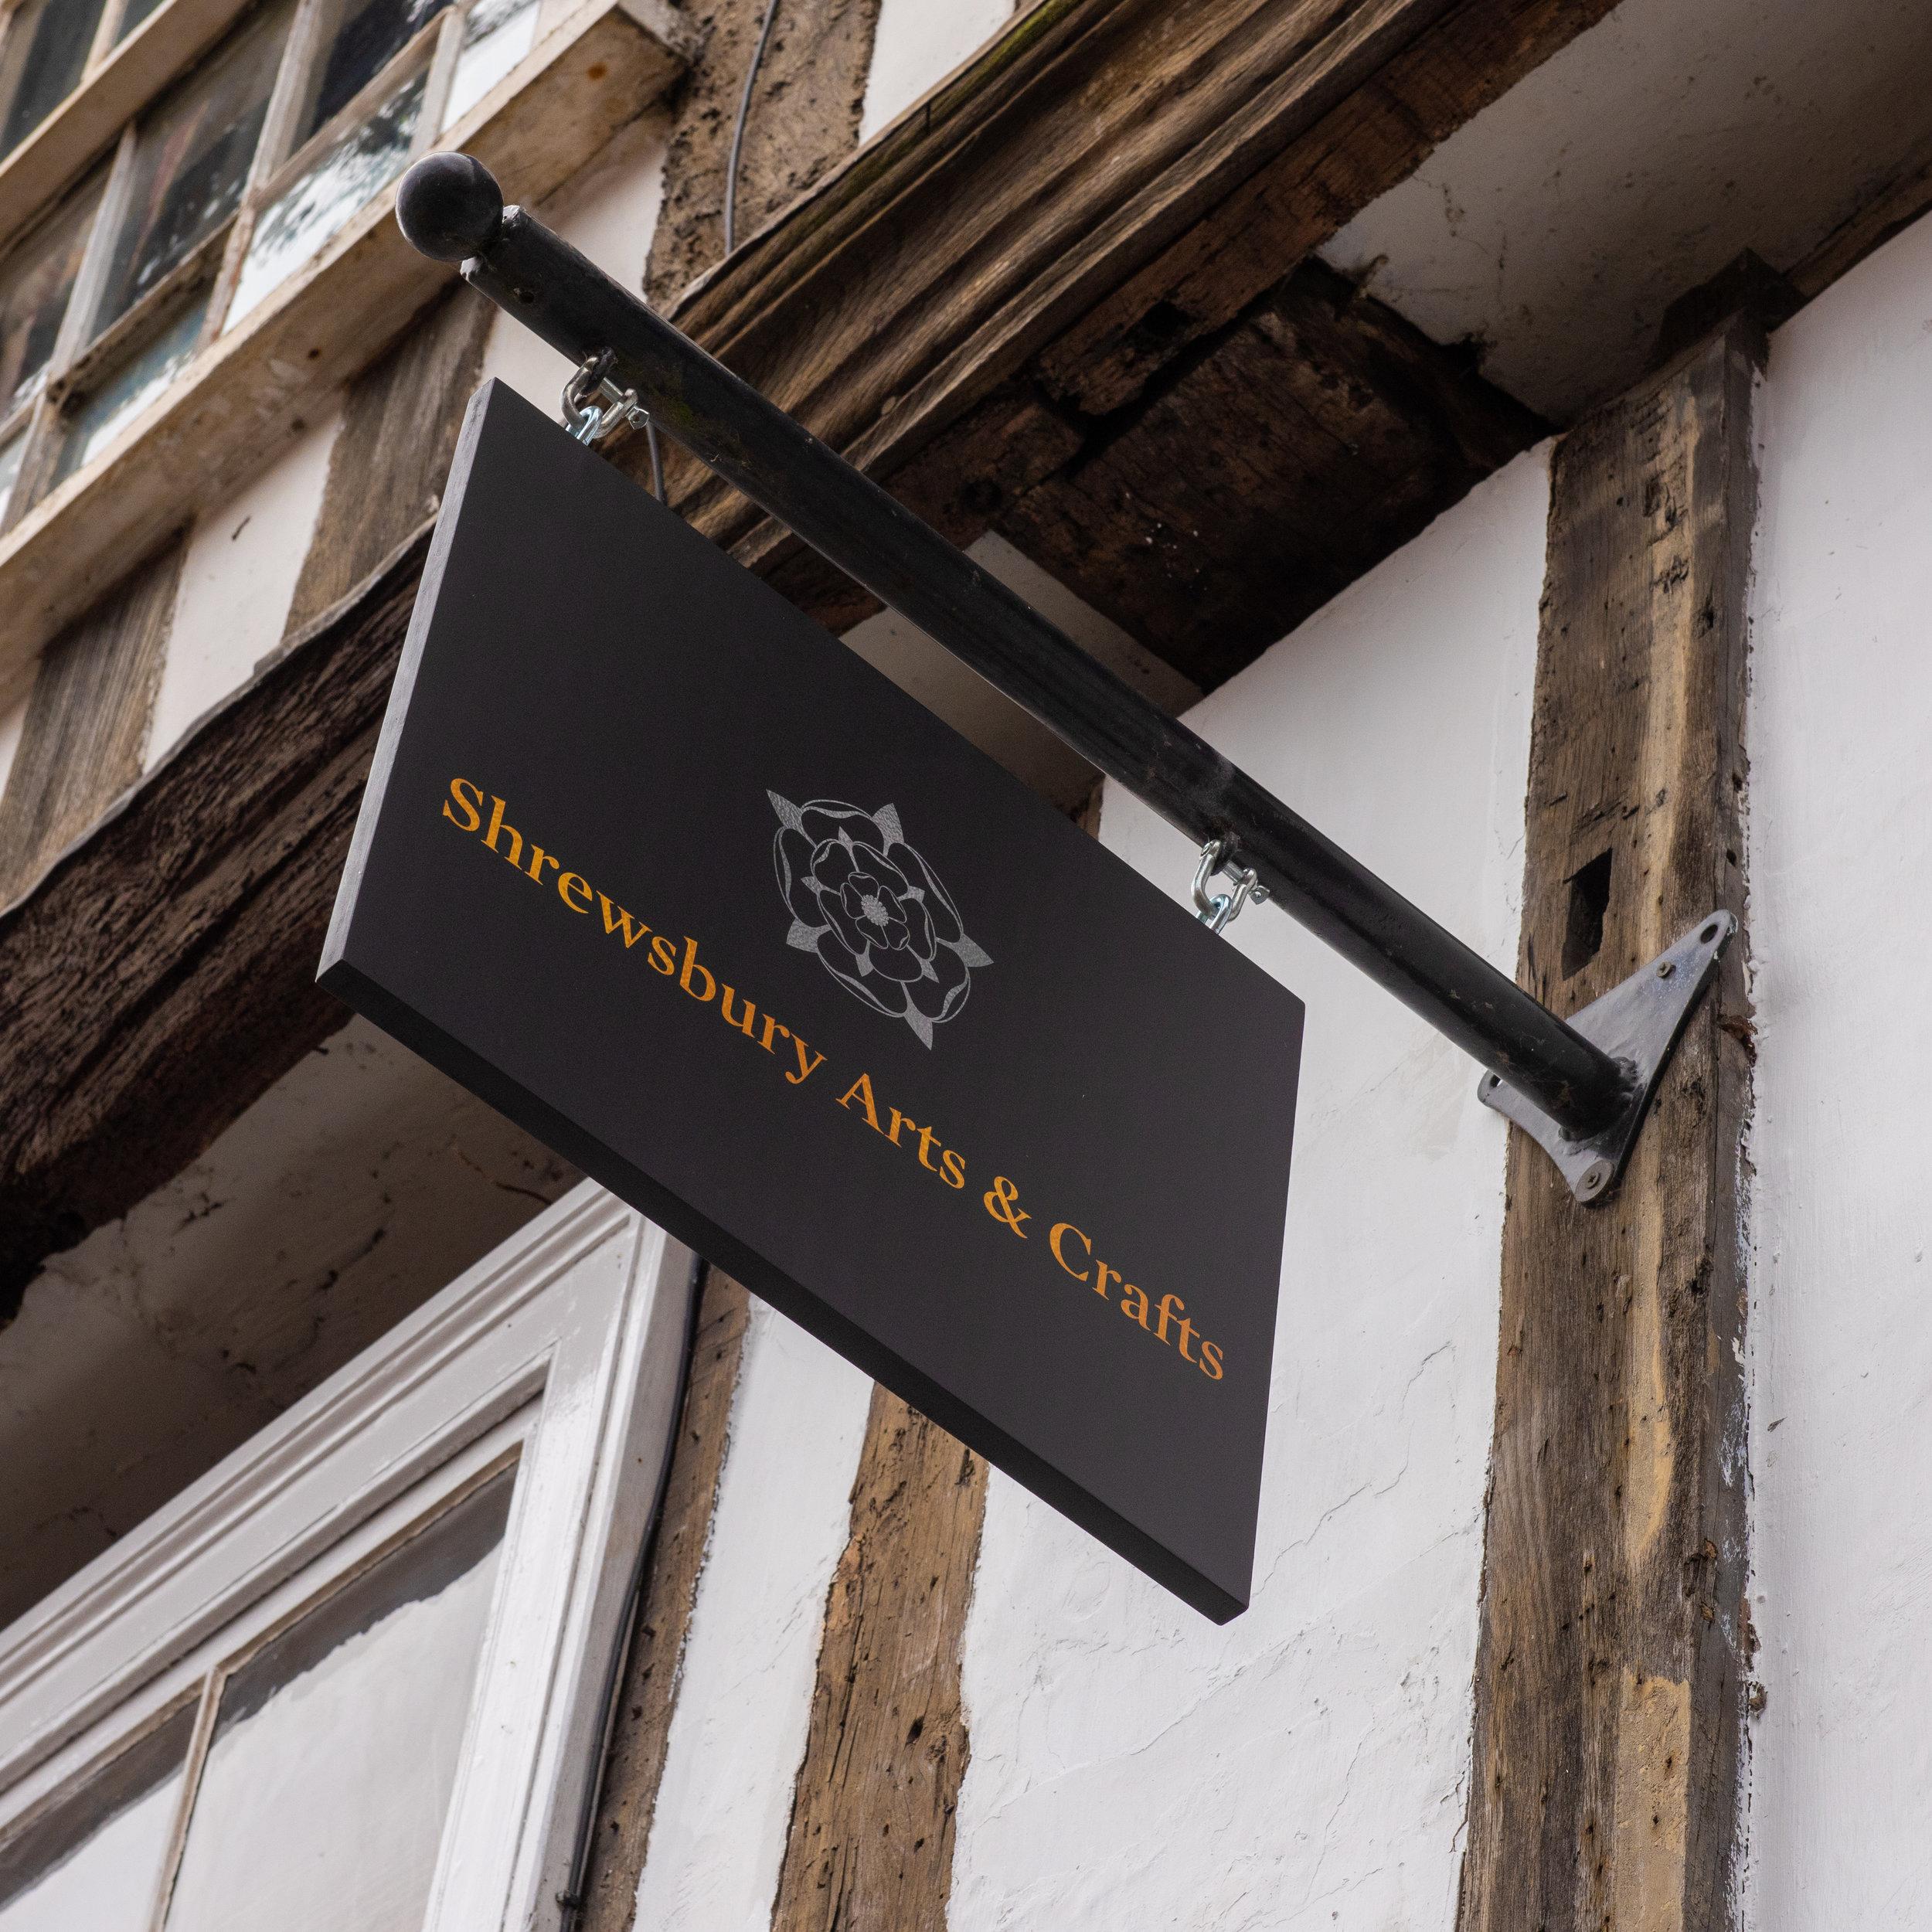 ShrewsburyArts&Crafts_Sign-9832.jpg